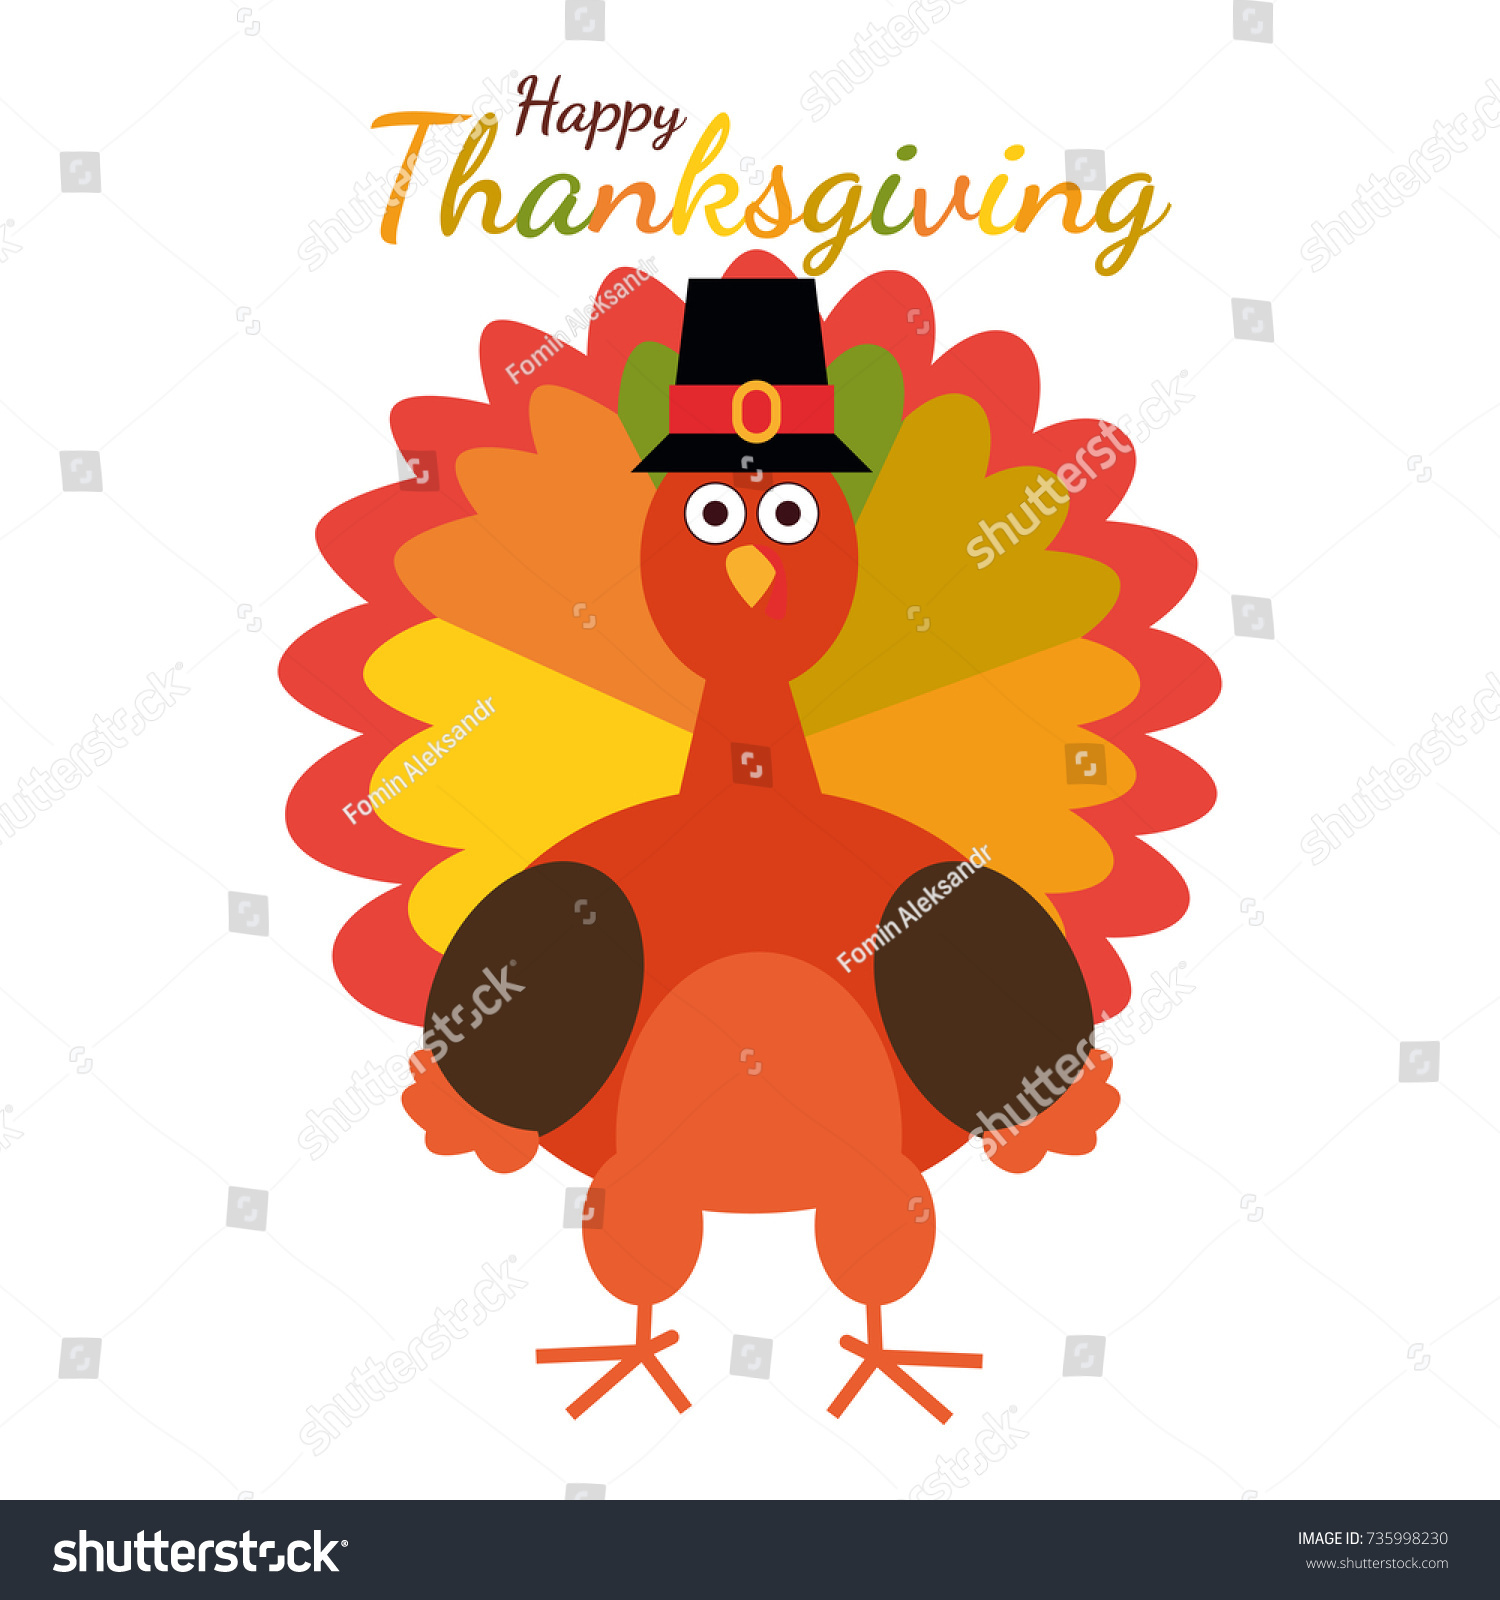 Happy Thanksgiving Greeting Card Funny Cartoon Stock Vector